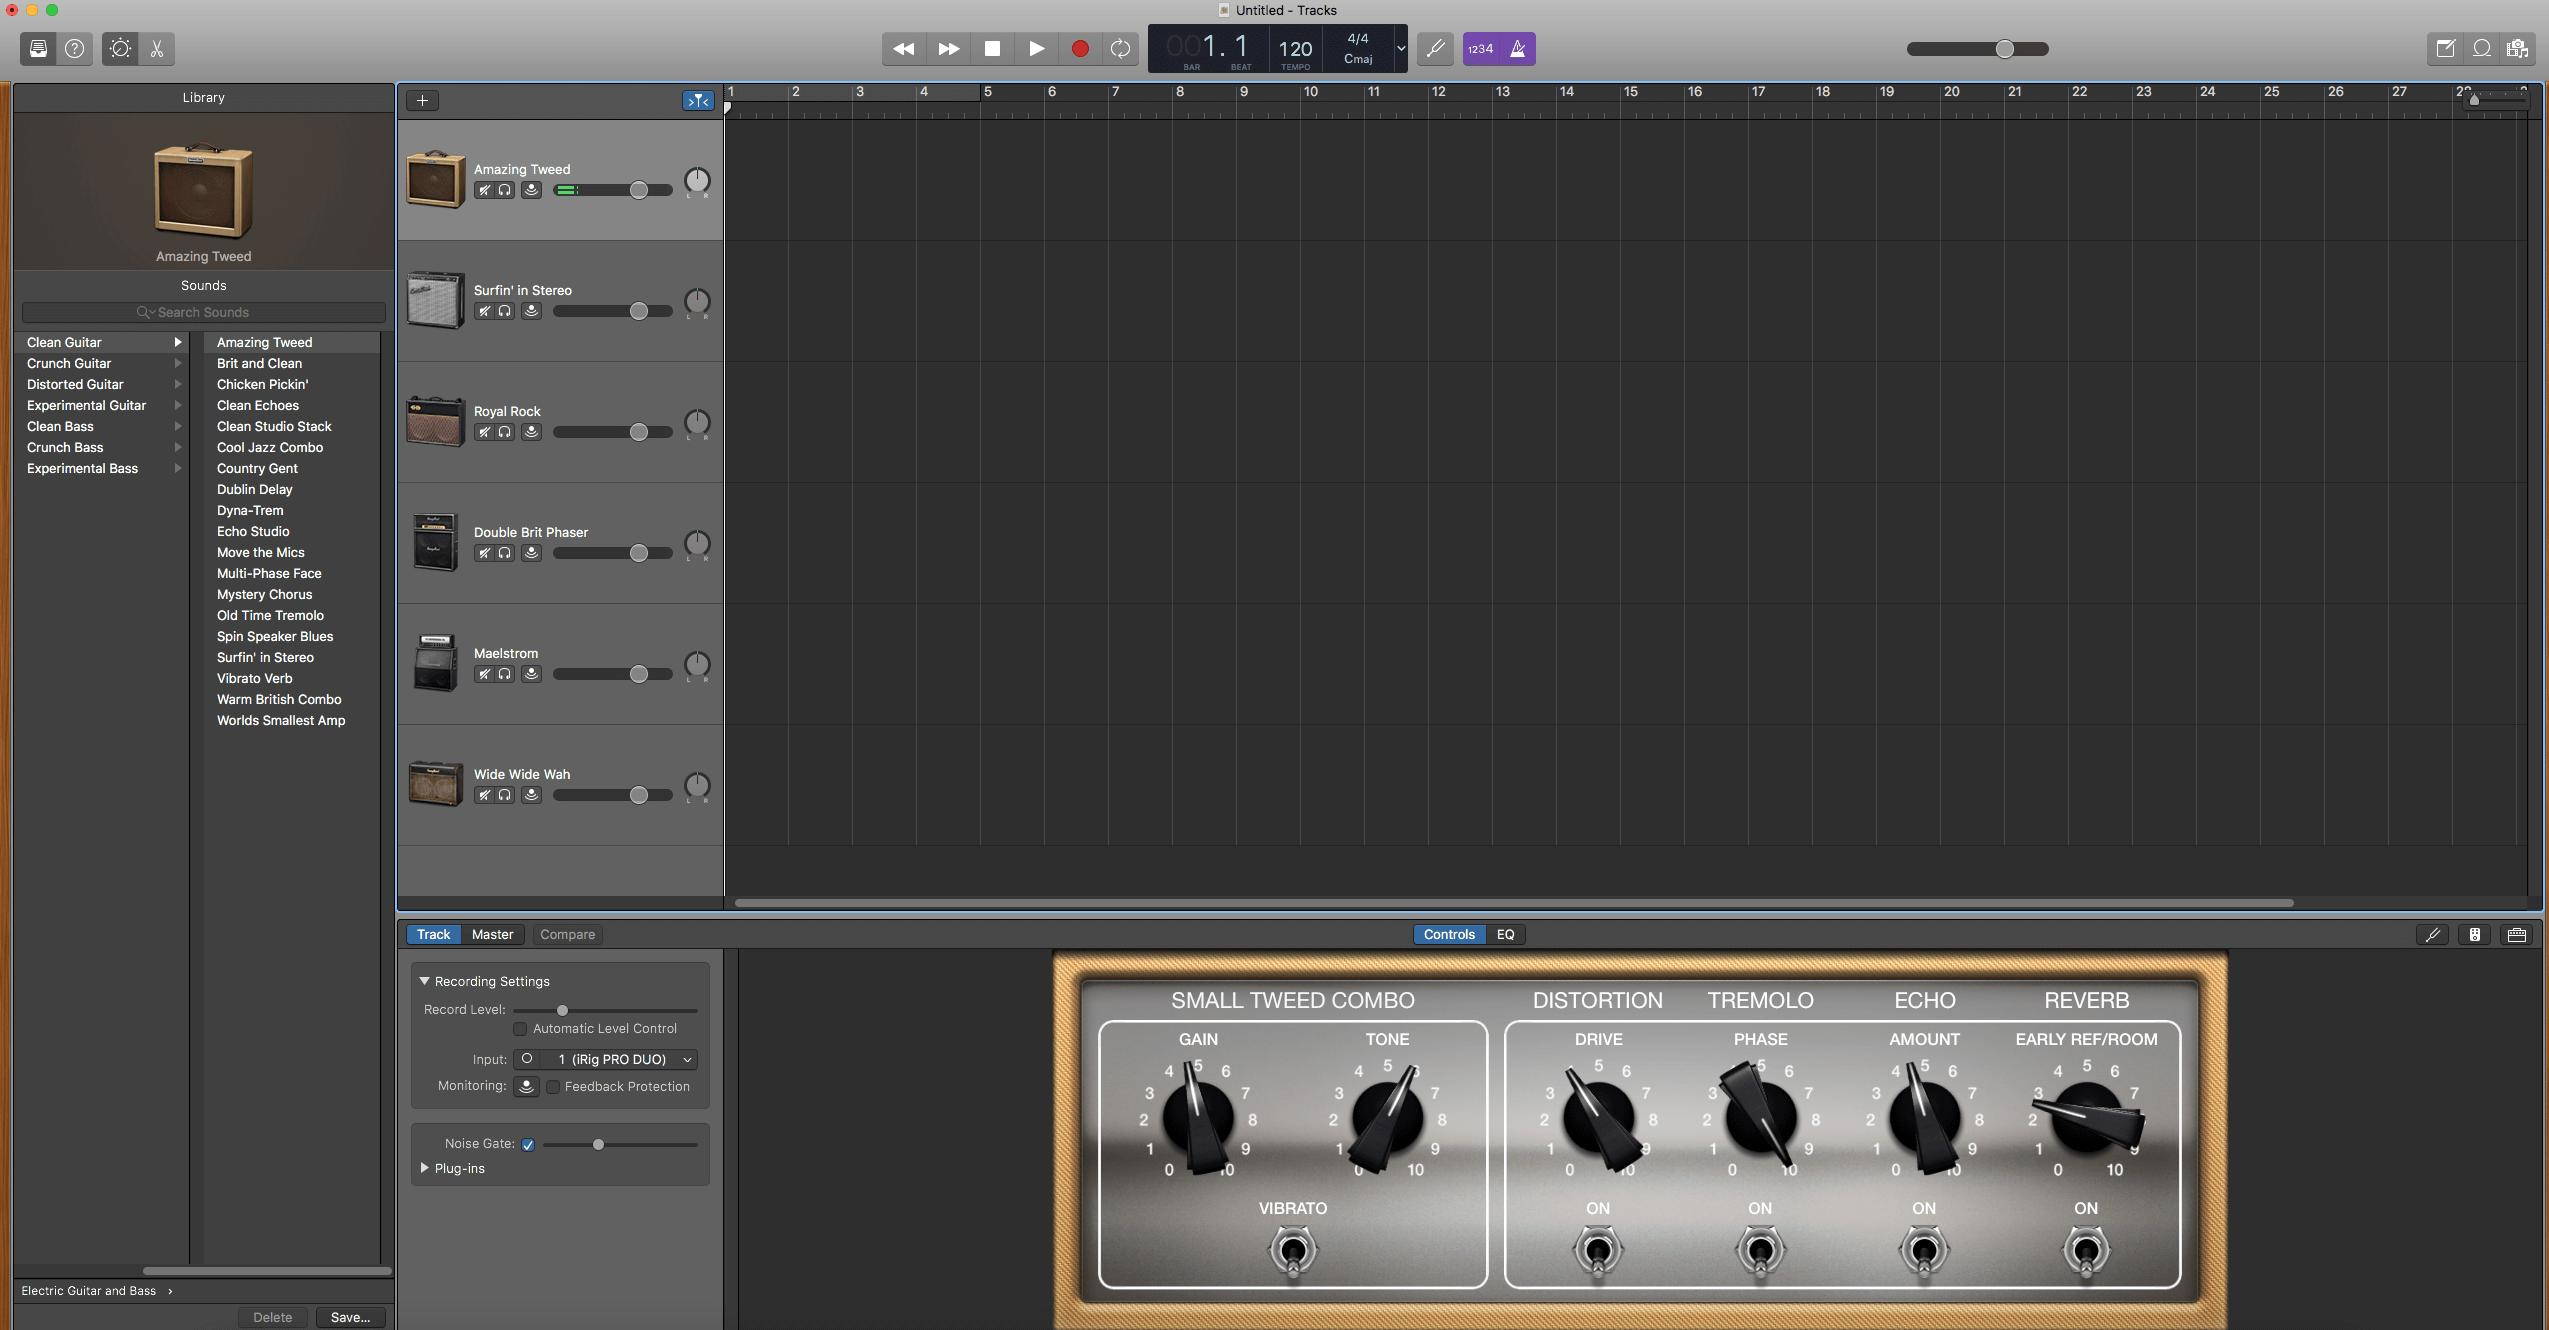 Cascading Delay Guitar Effect in GarageBand